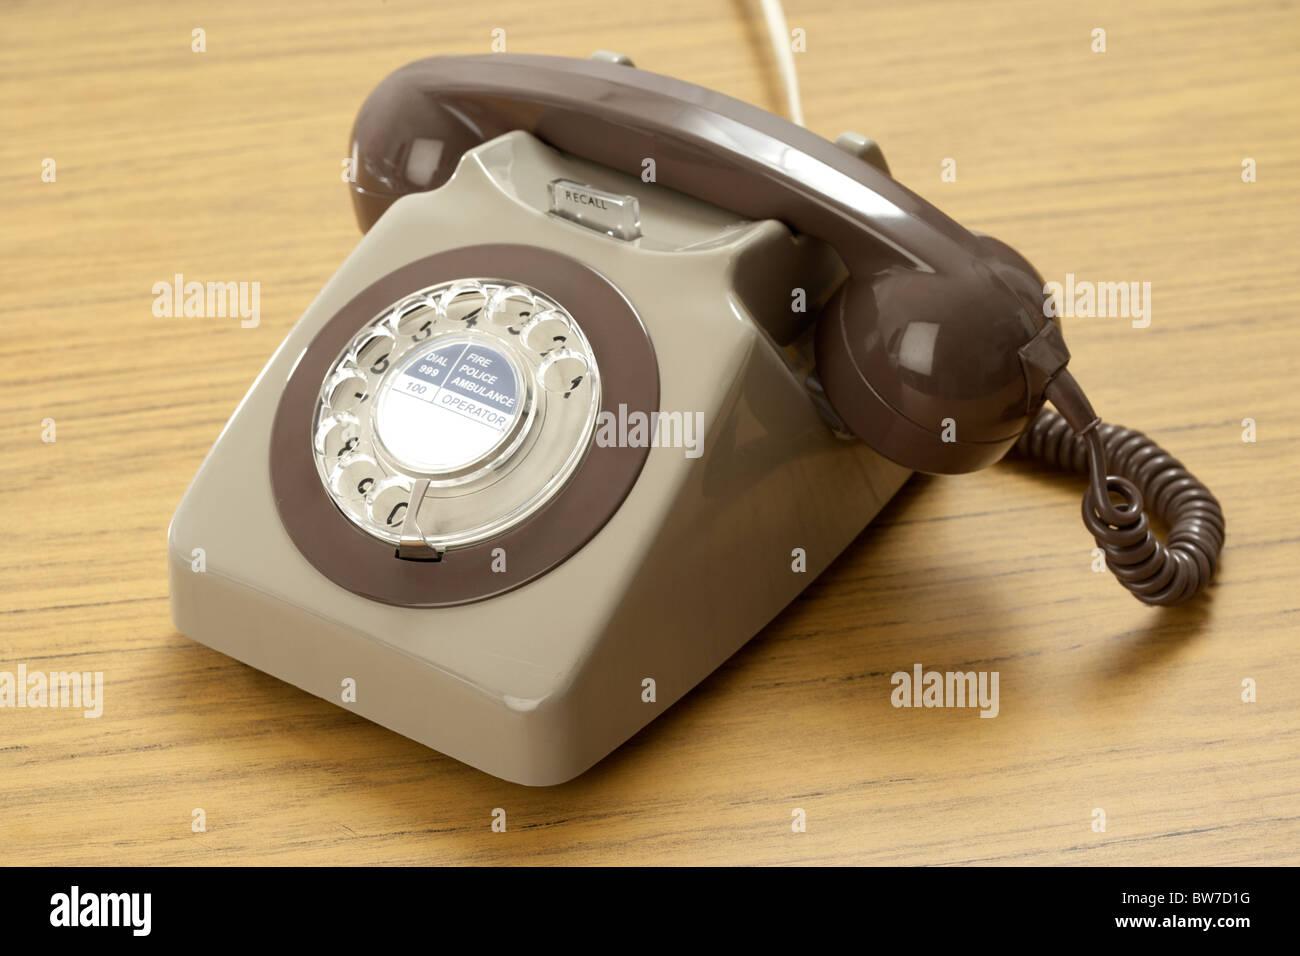 Old Retro Gpo 746 British Telecom Rotary Dial Phone Stock Photo ...